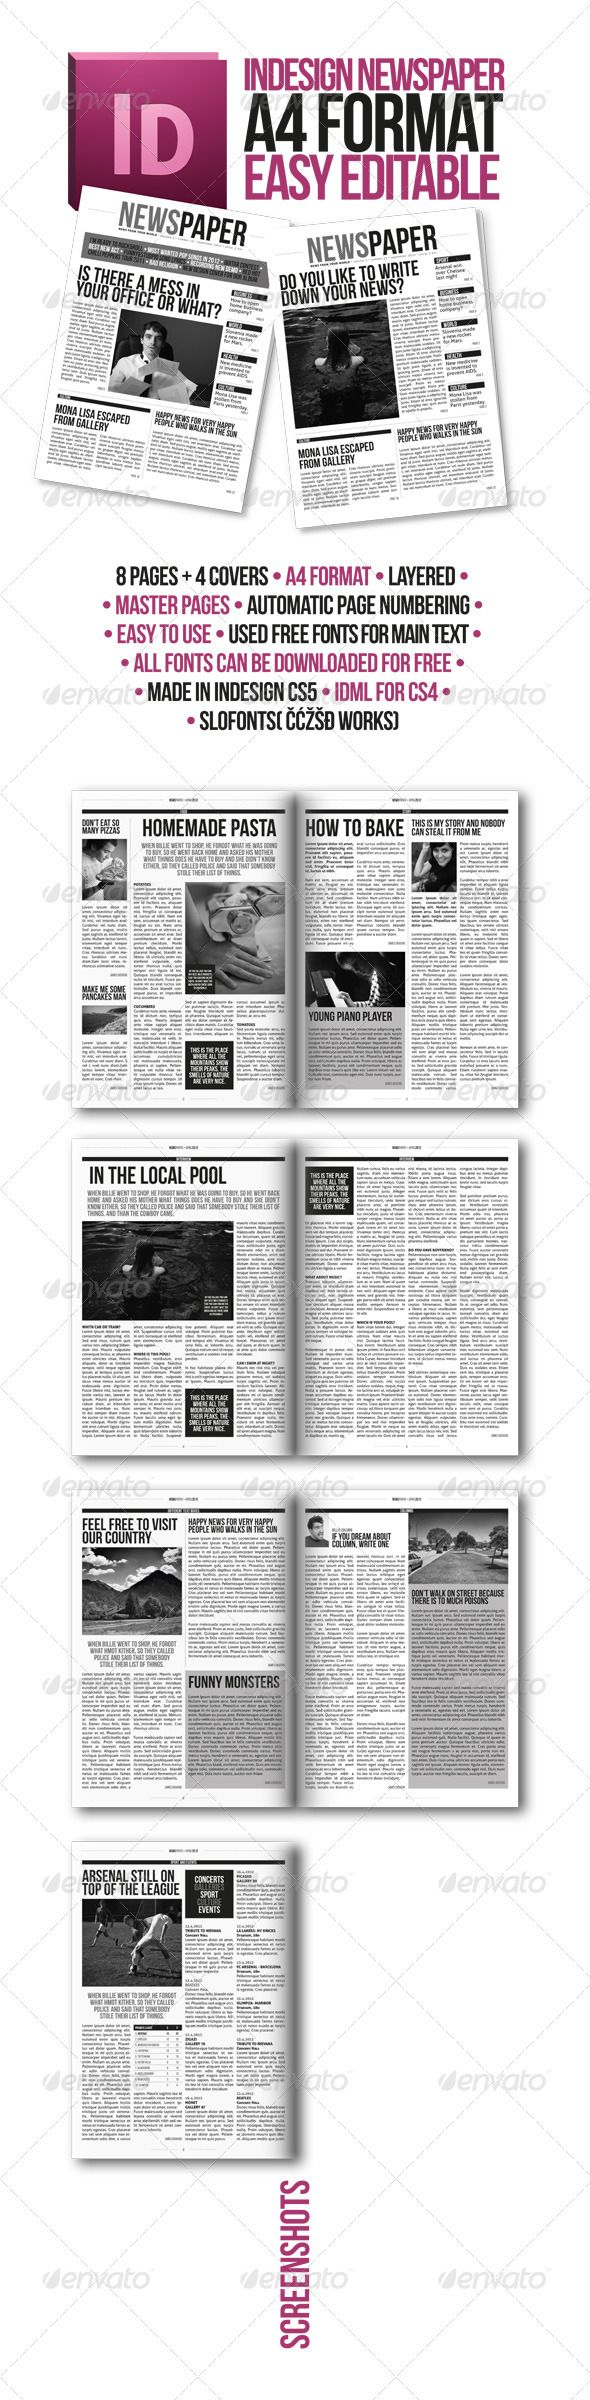 Indesign Modern Newspaper Magazine Template A4 | Diseño editorial ...